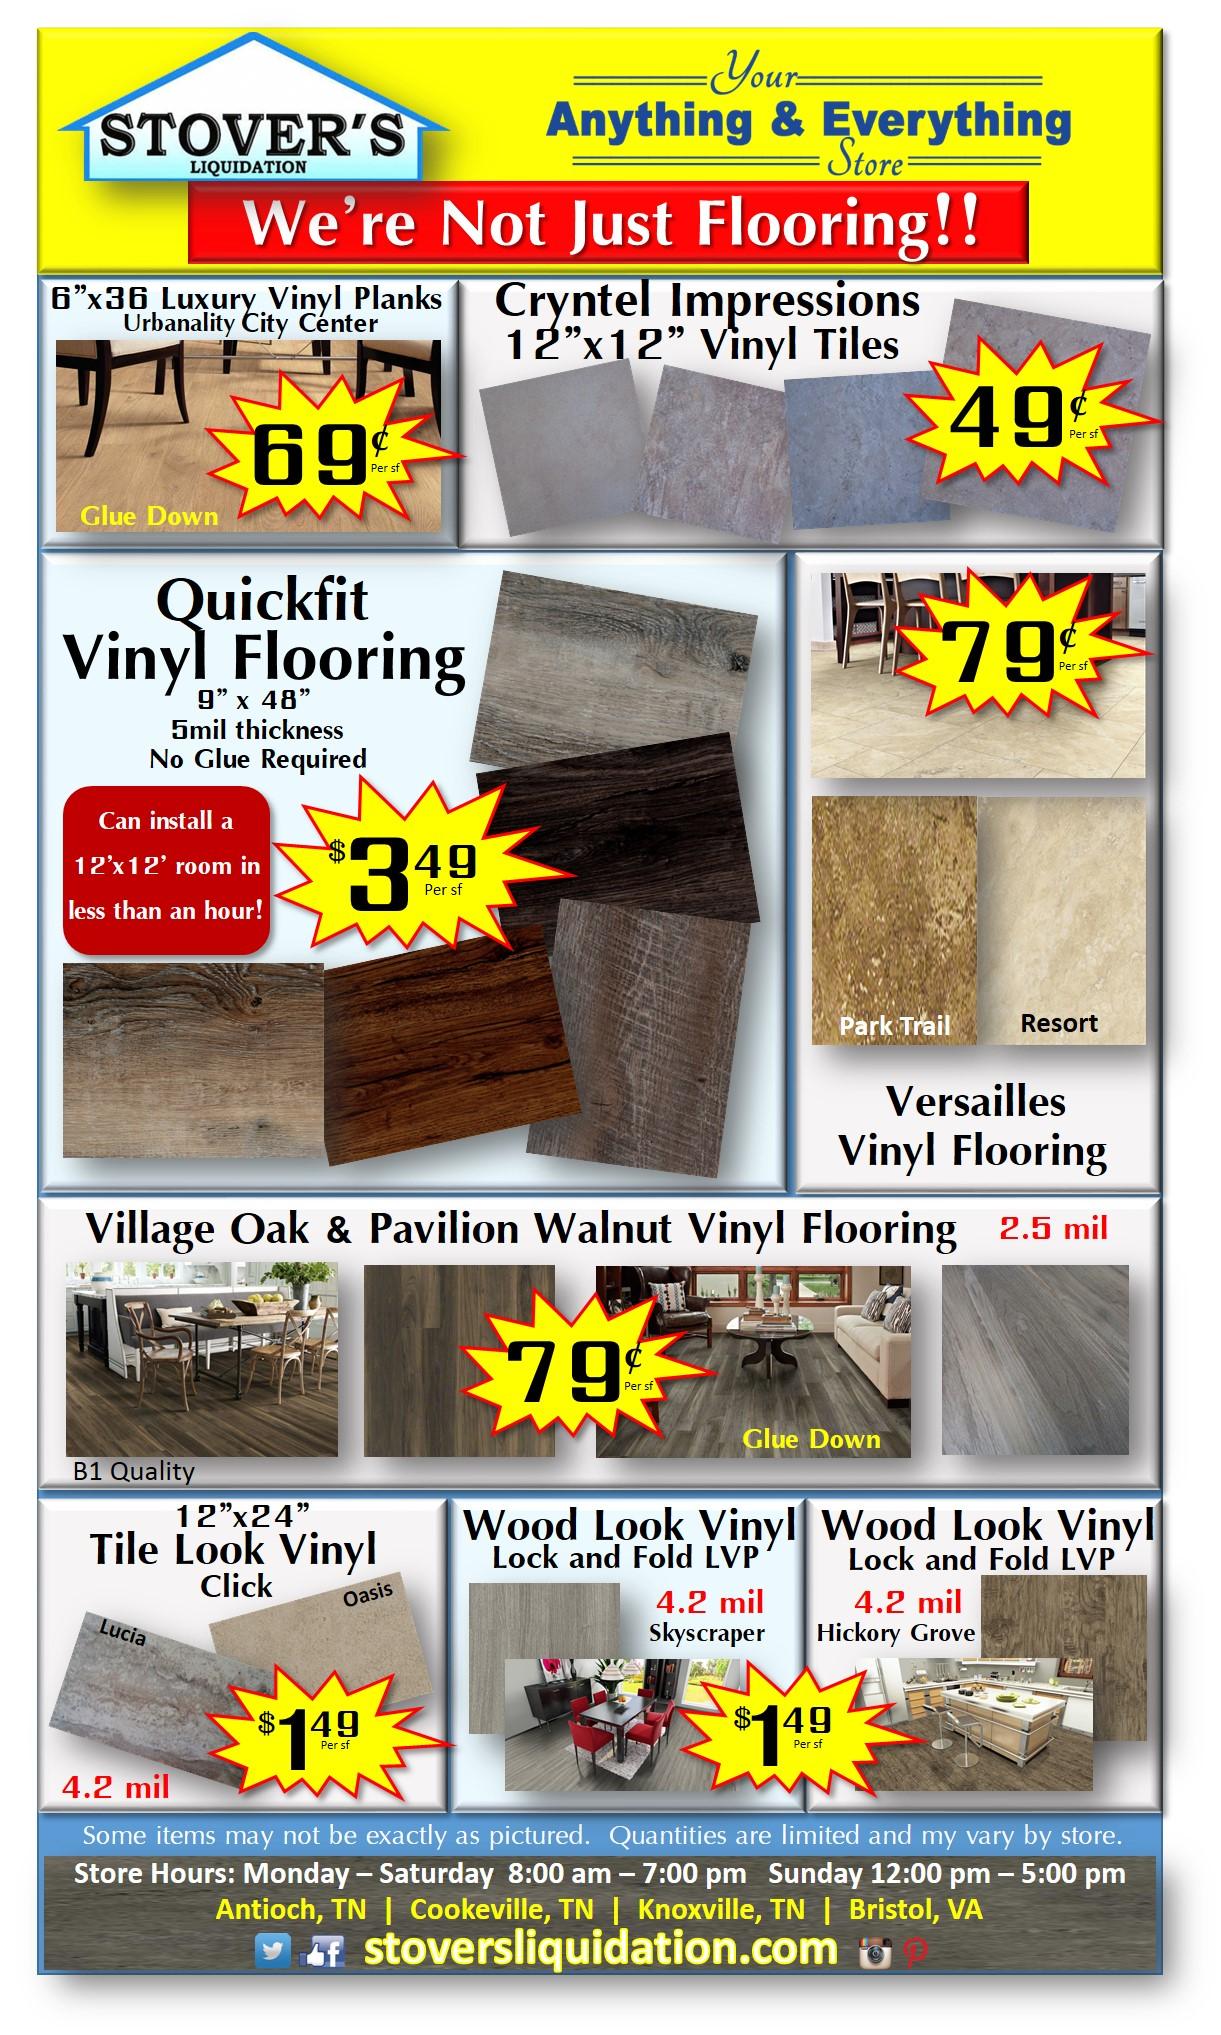 sales-ad-page-3.jpg